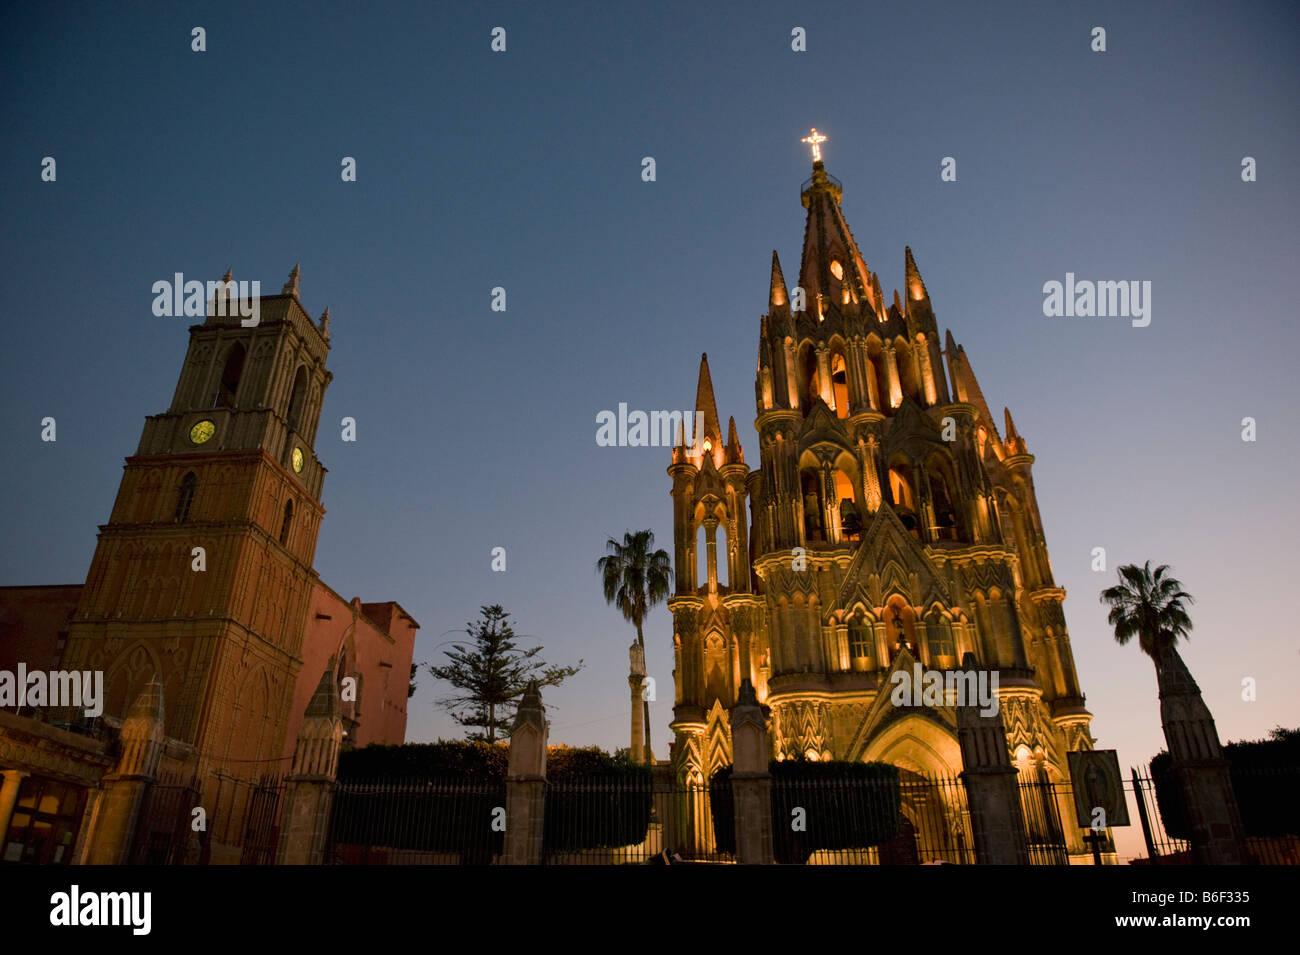 Parroquia Church at dusk, Colonial Center of San Miguel de Allende, MEXICO - Stock Image